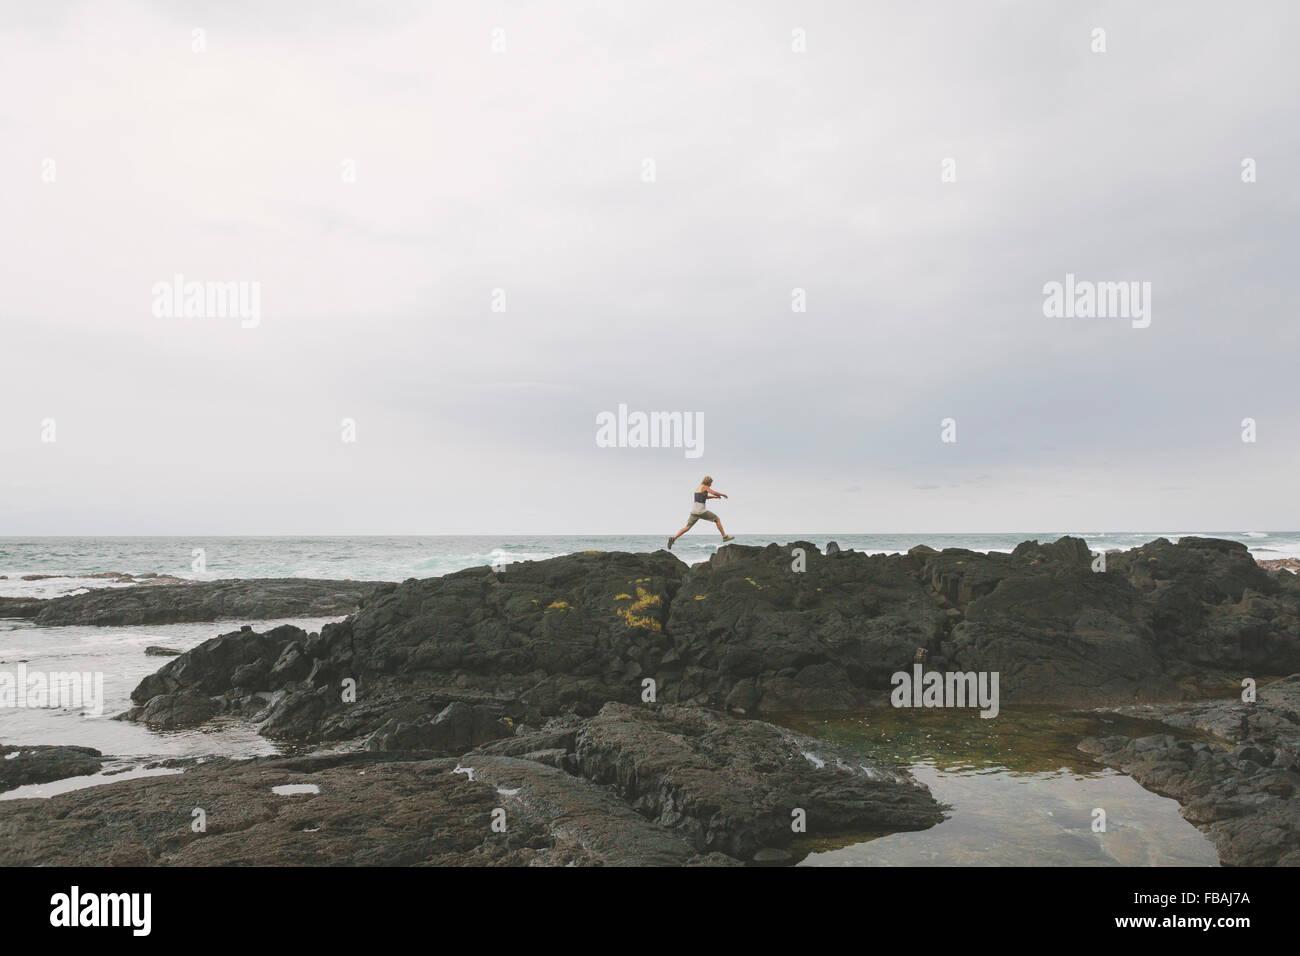 USA, Hawaii, Big Island, Mann springt über Geklüft Felsformation am Meeresstrand Stockbild